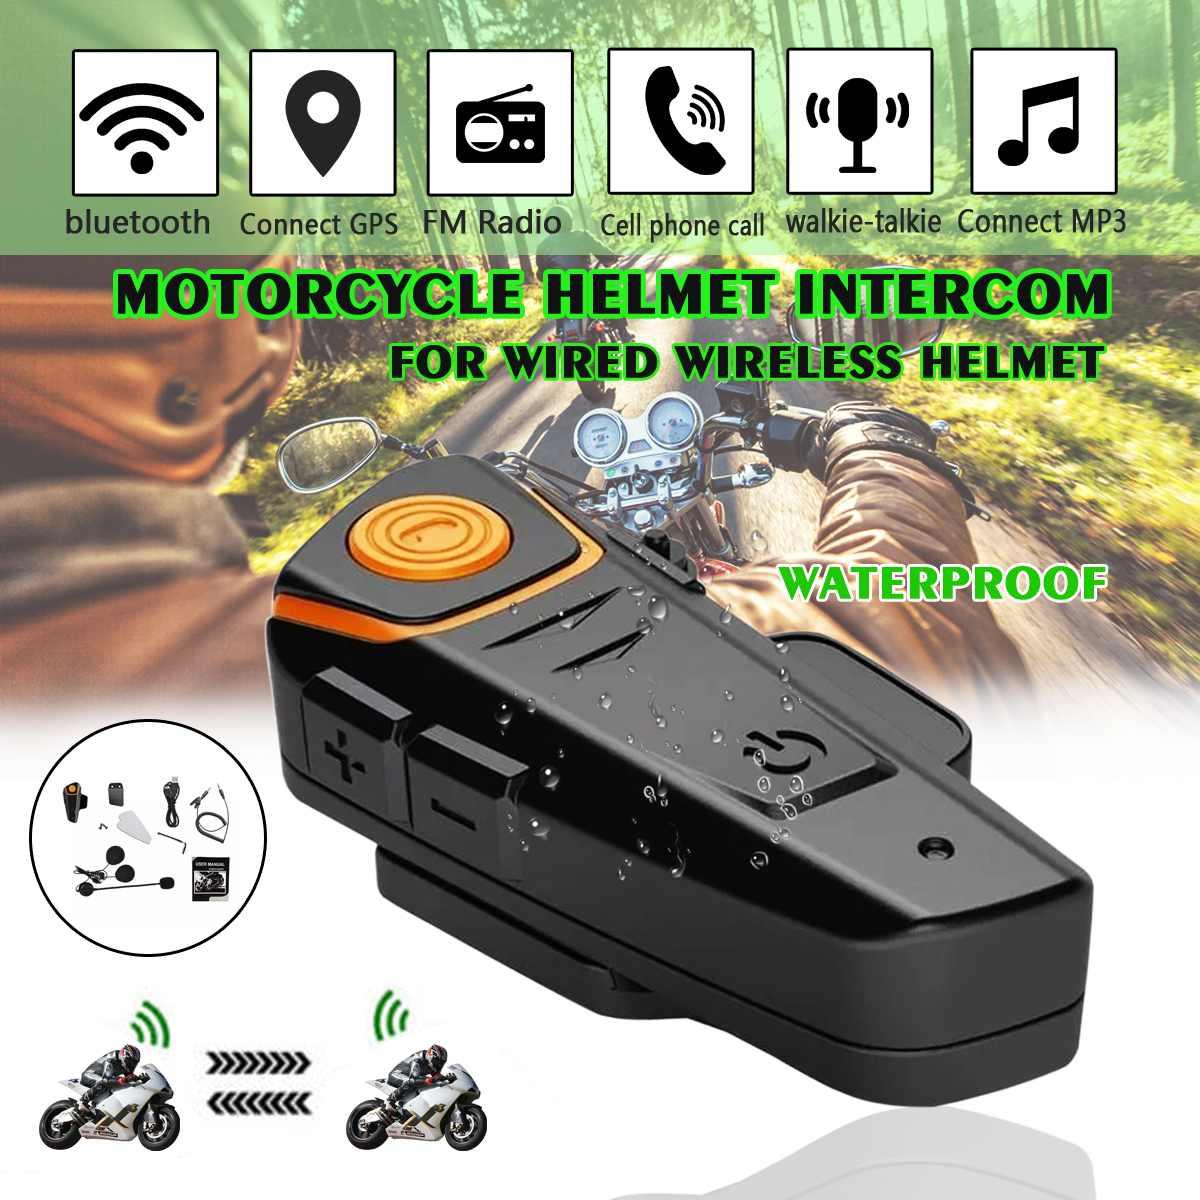 Waterproof BT-S2 Multi BT Interphone 1000M Motorcycle Bluetooth Helmet Intercom Intercomunicador Moto Interfones Headset FM MP3